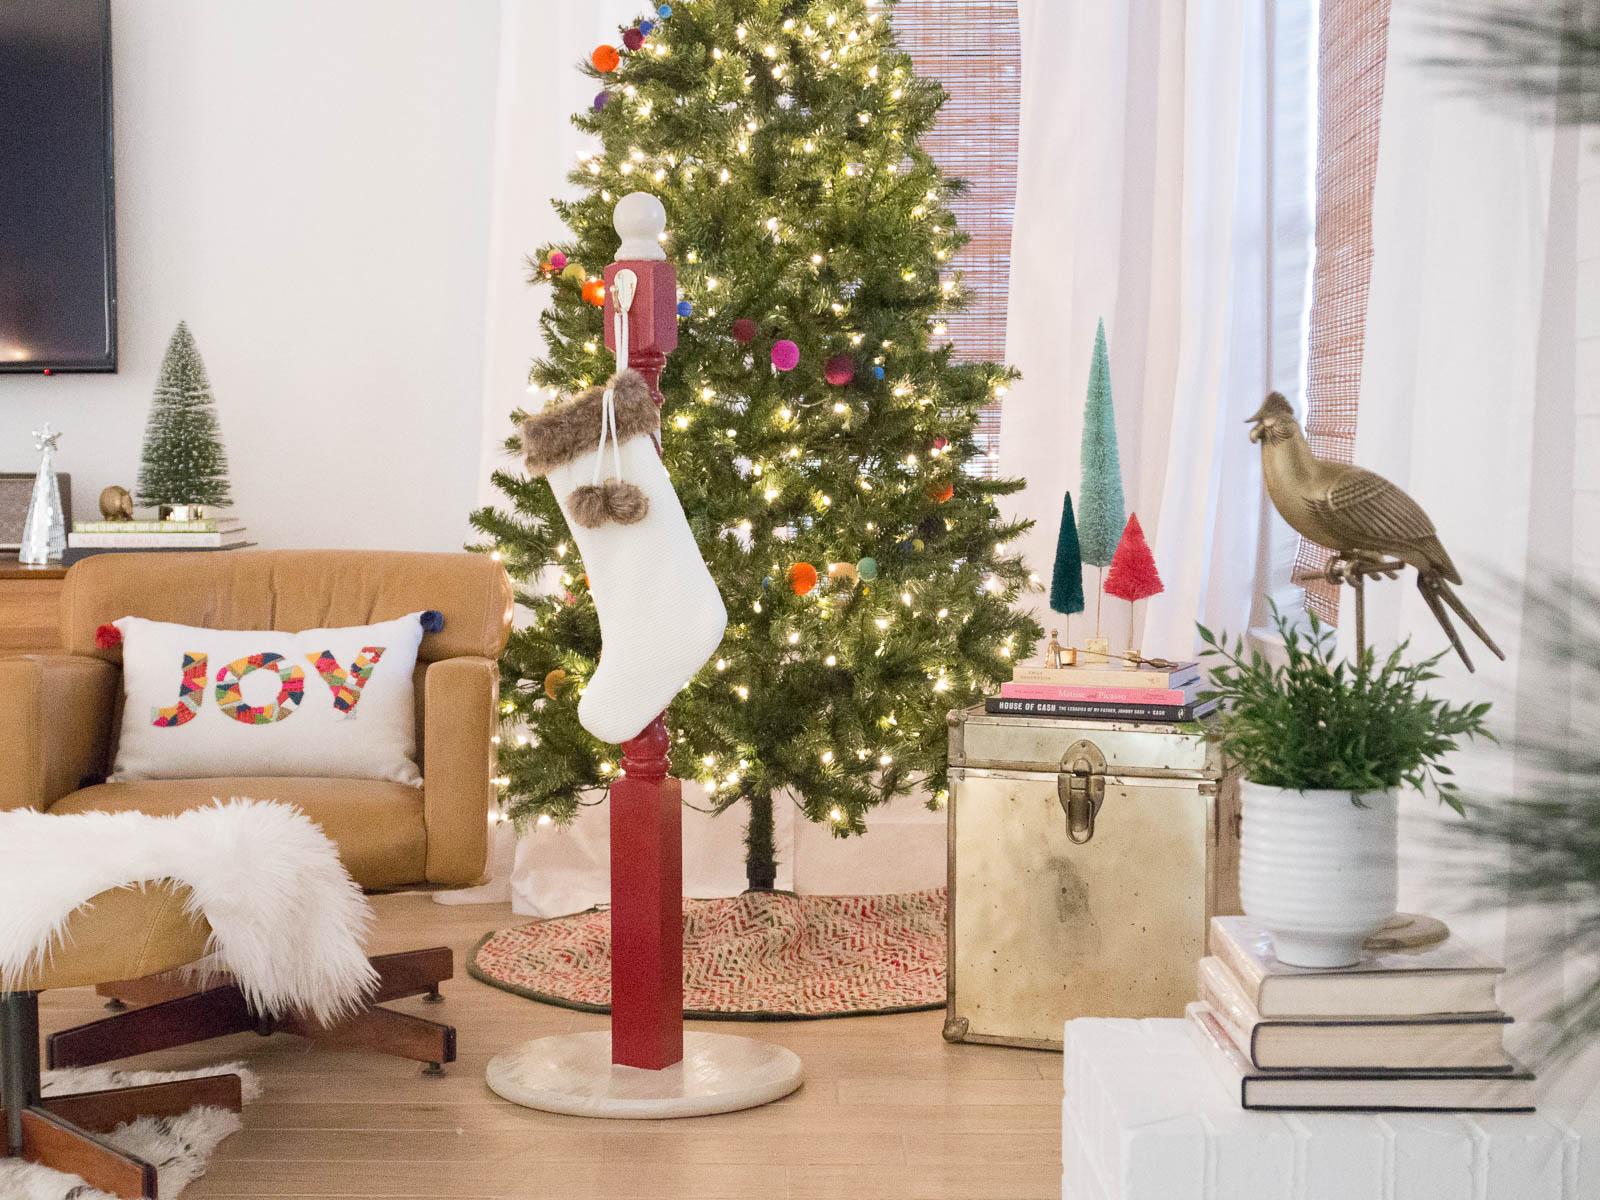 Diy standing stocking holder spray paint chardonnay